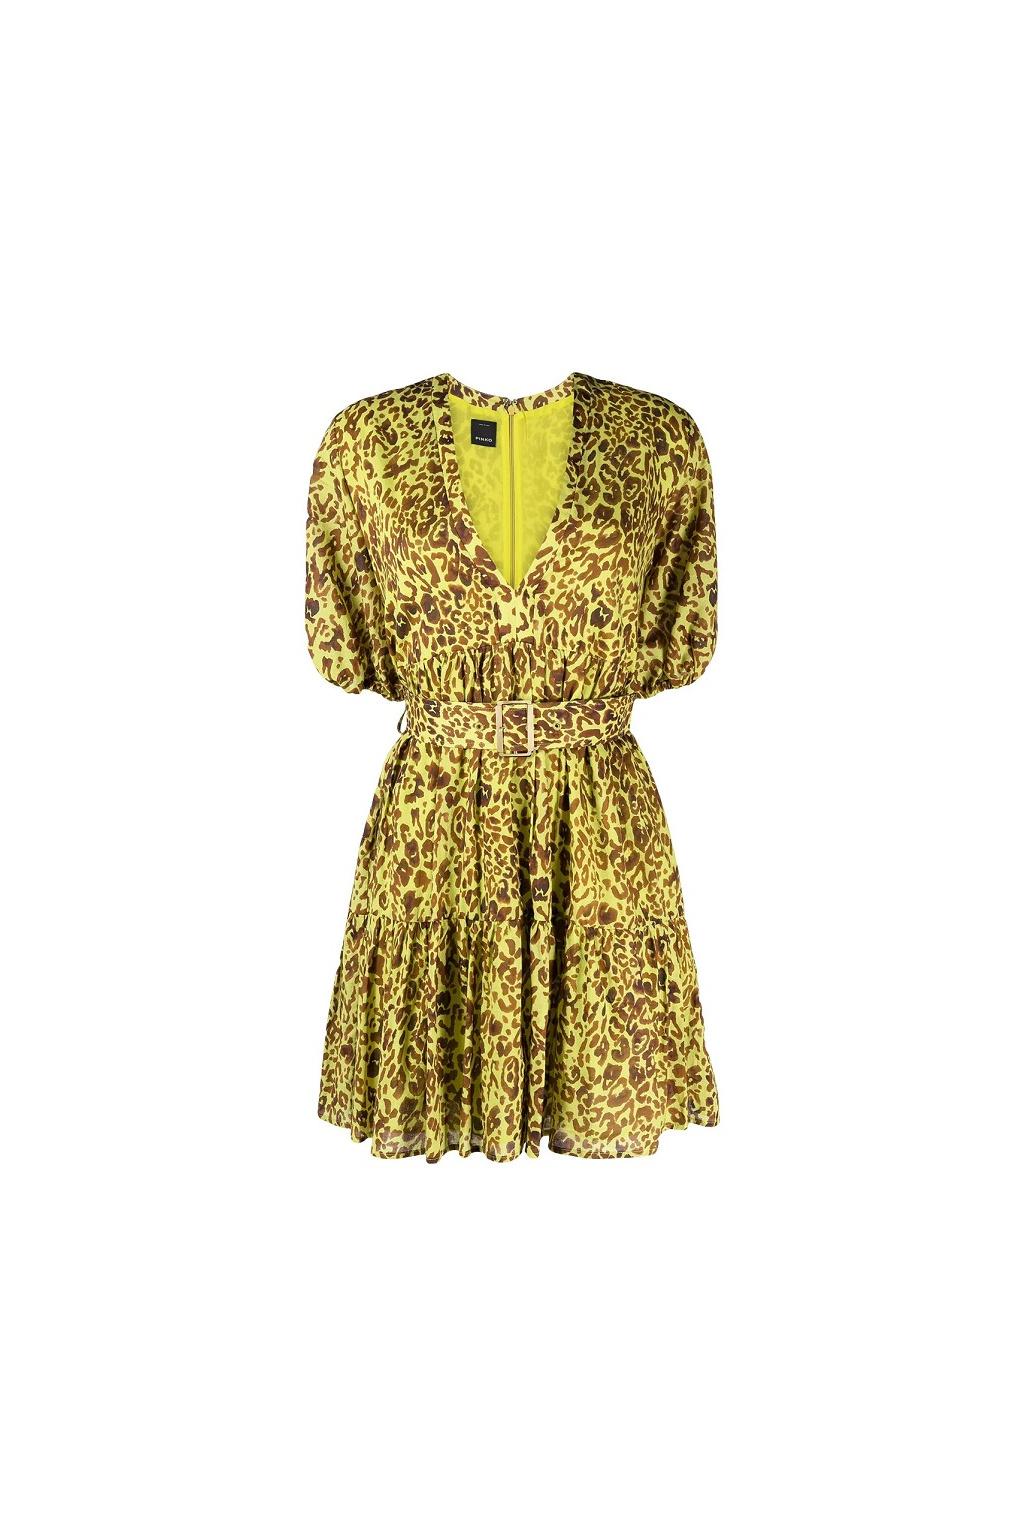 1G164F 8468 VAM Dámské šaty Pinko Nuvoloso barevné